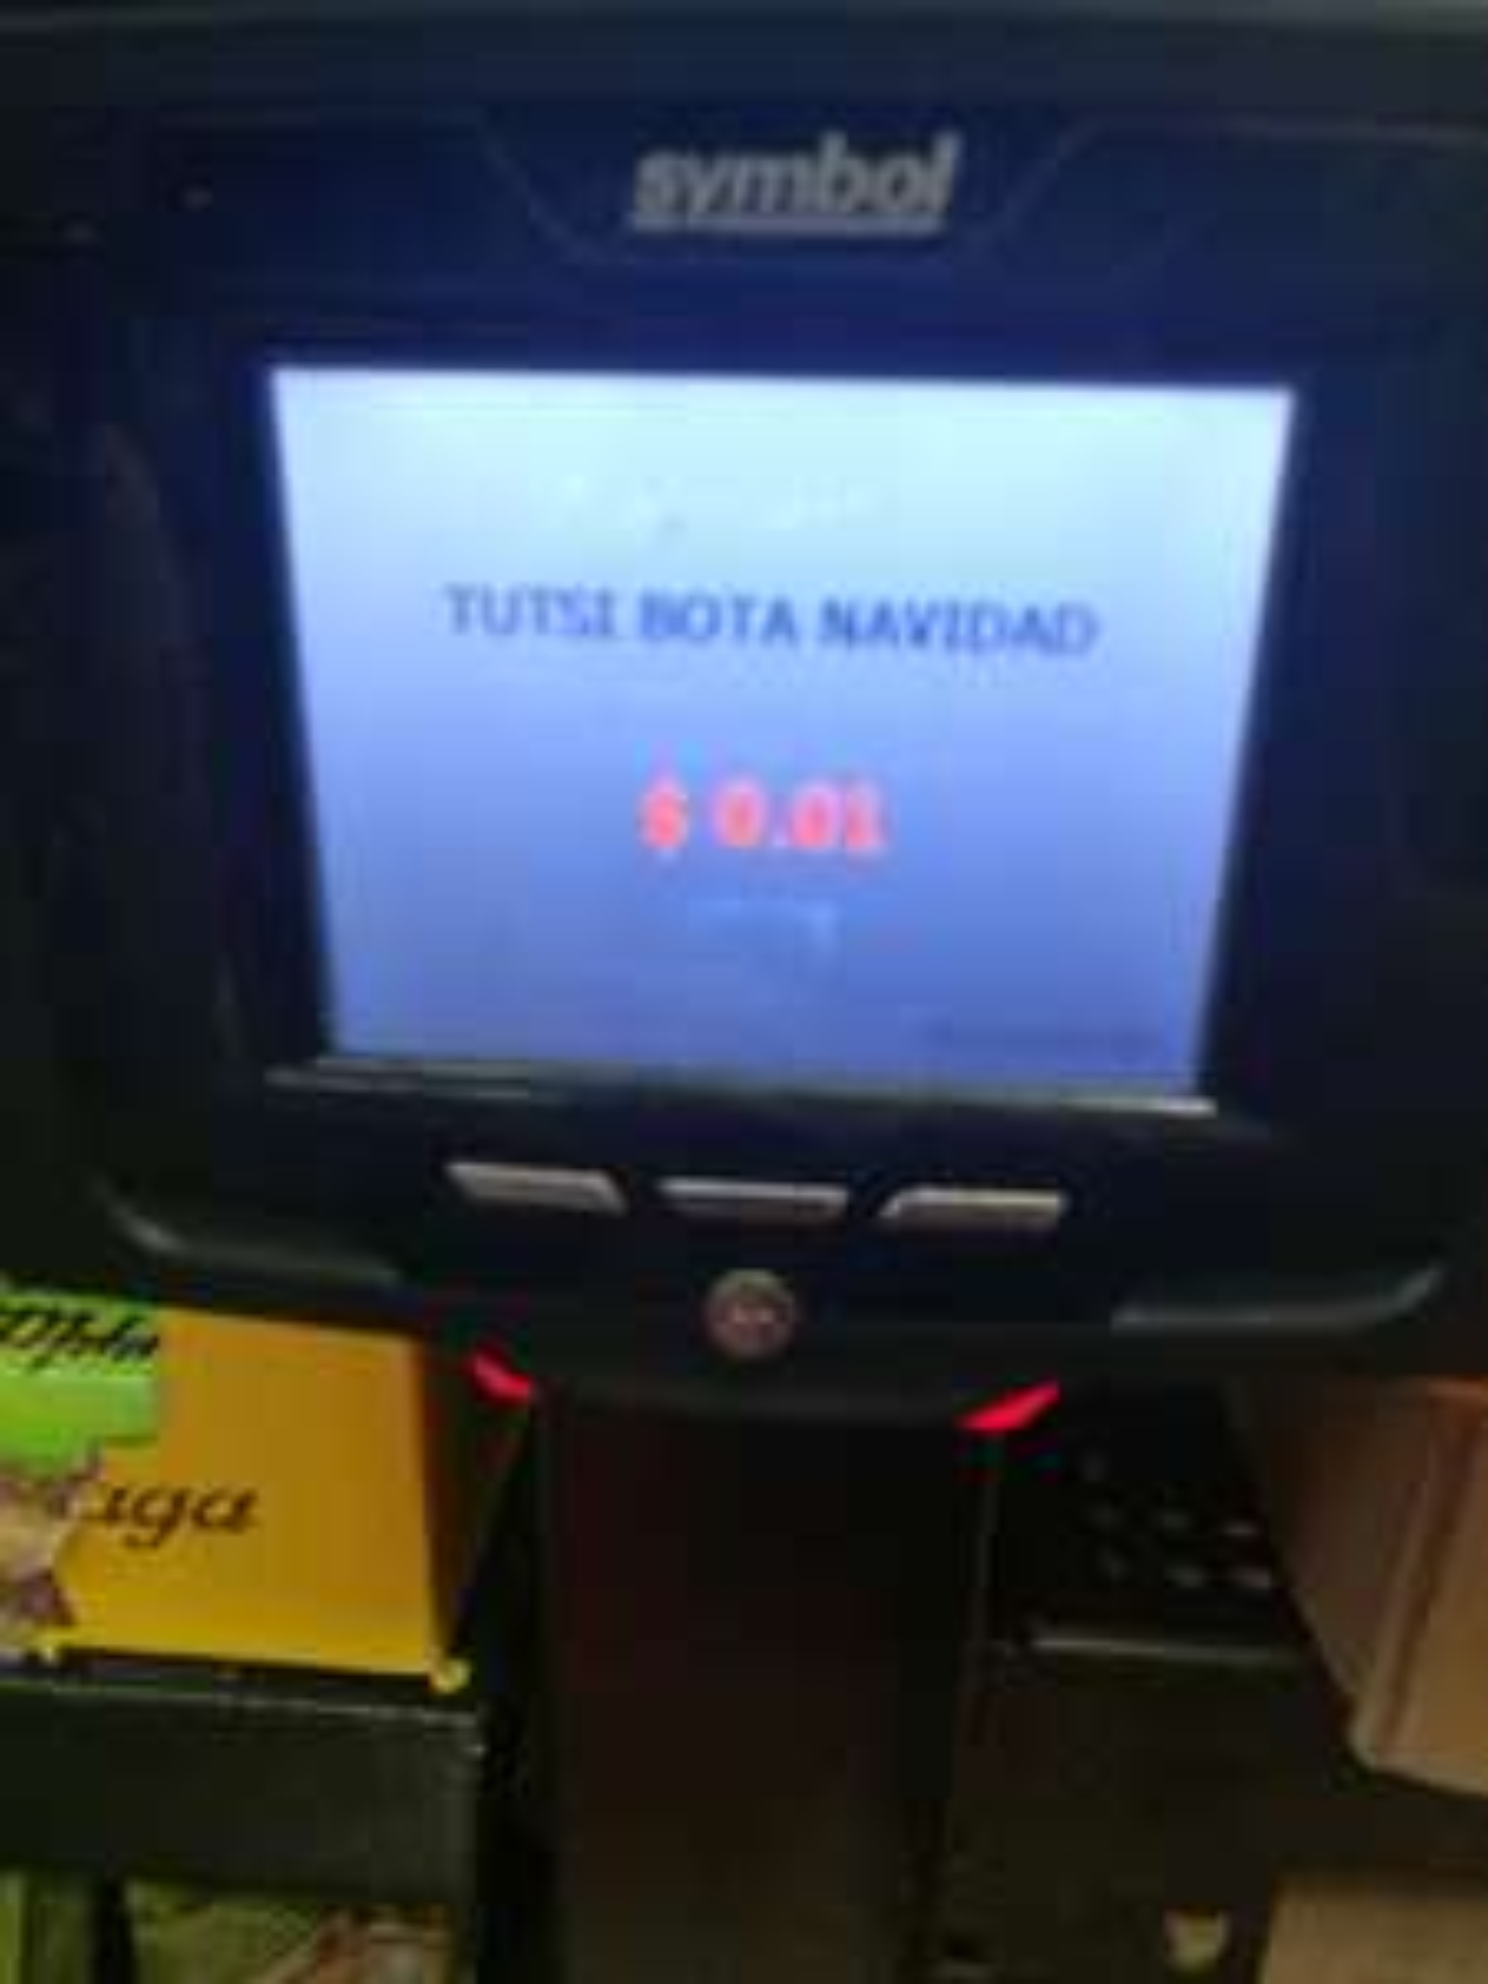 Walmart México 68: Tutsibota a 0.01 Promonovela